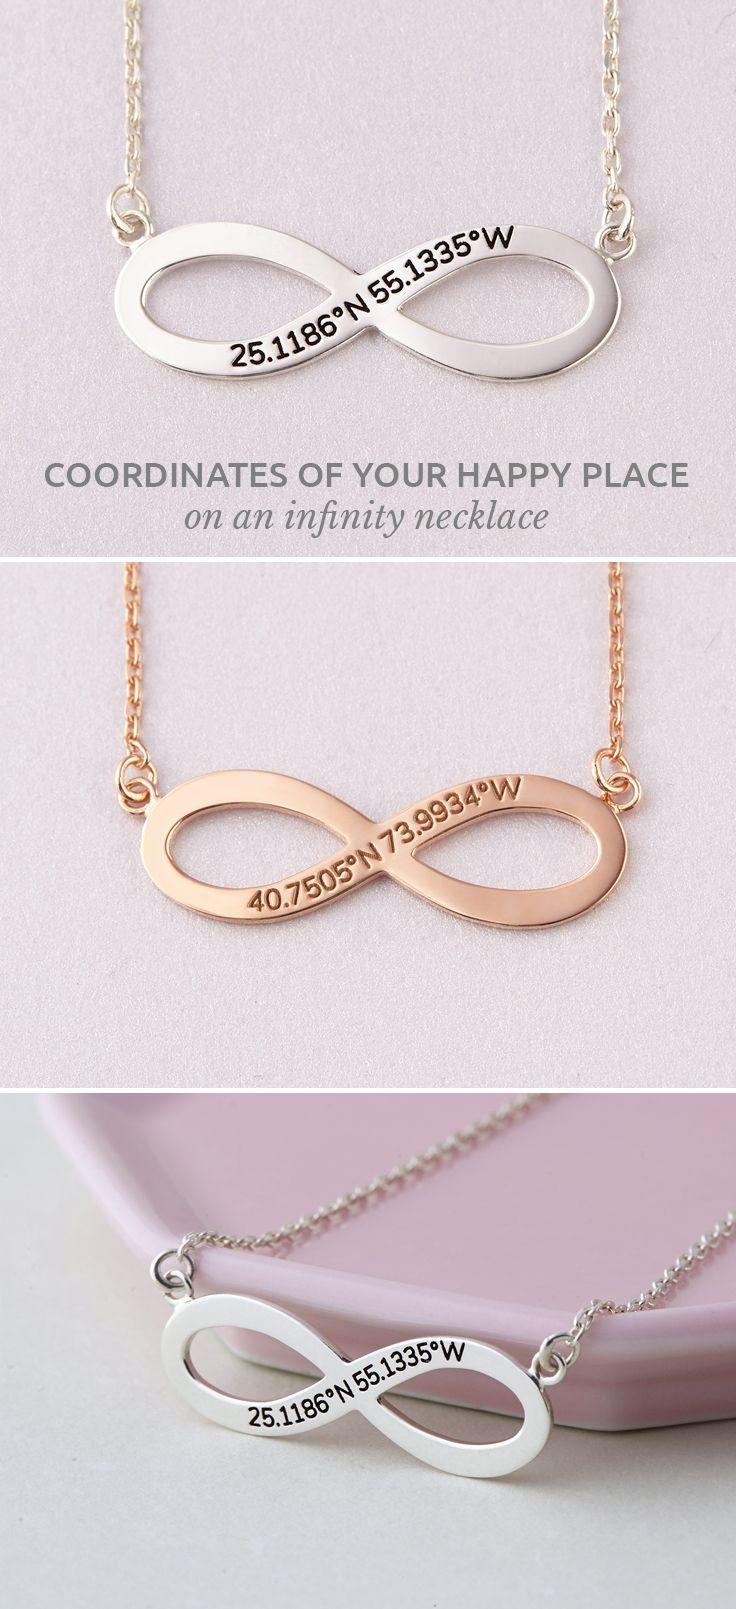 Infinity Coordinate Necklace • Coordinates Necklace • Longitude Latitude Nec...